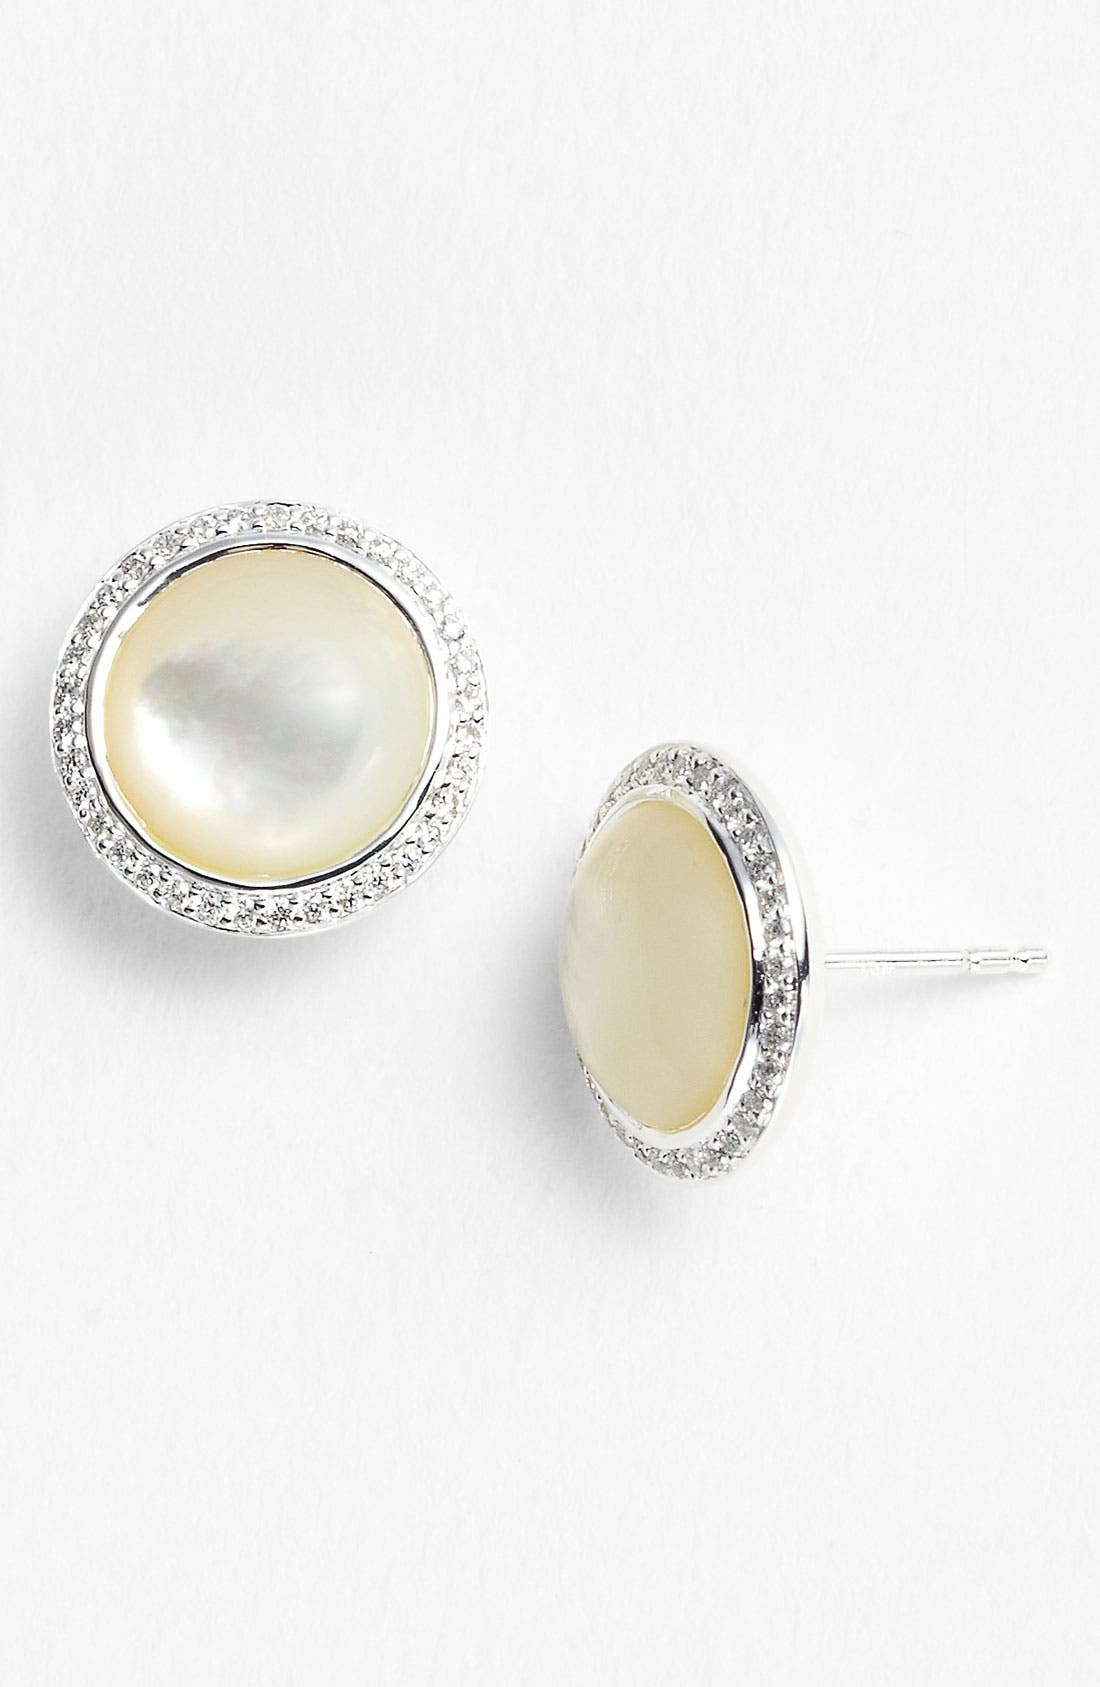 Alternate Image 1 Selected - Ippolita 'Scultura' Diamond & Cabochon Stud Earrings